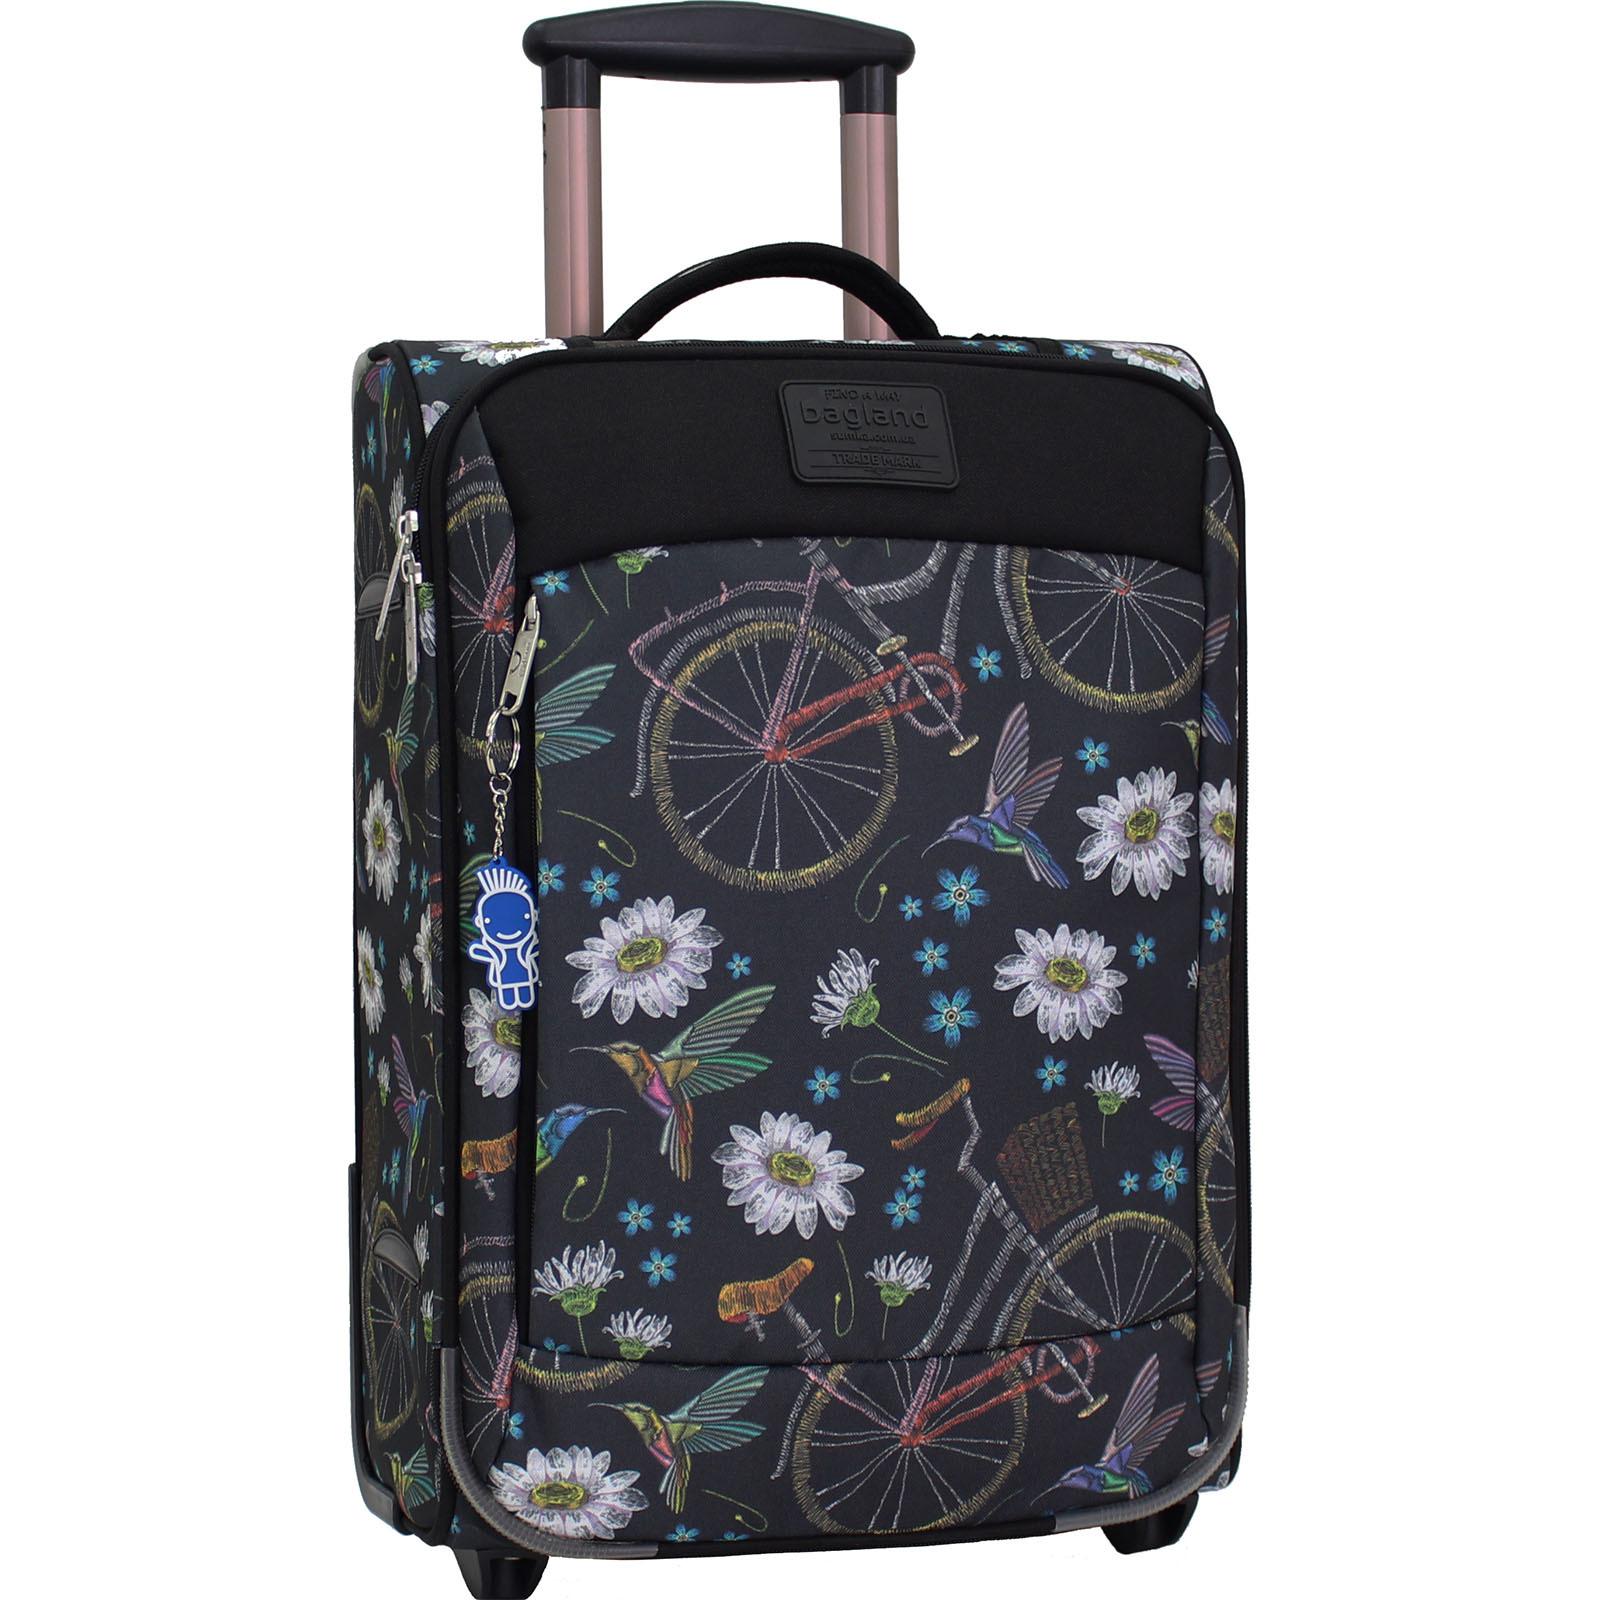 Дорожные чемоданы Чемодан Bagland Vichenzo 32 л. сублімація 194 (0037666194) IMG_1373.JPG